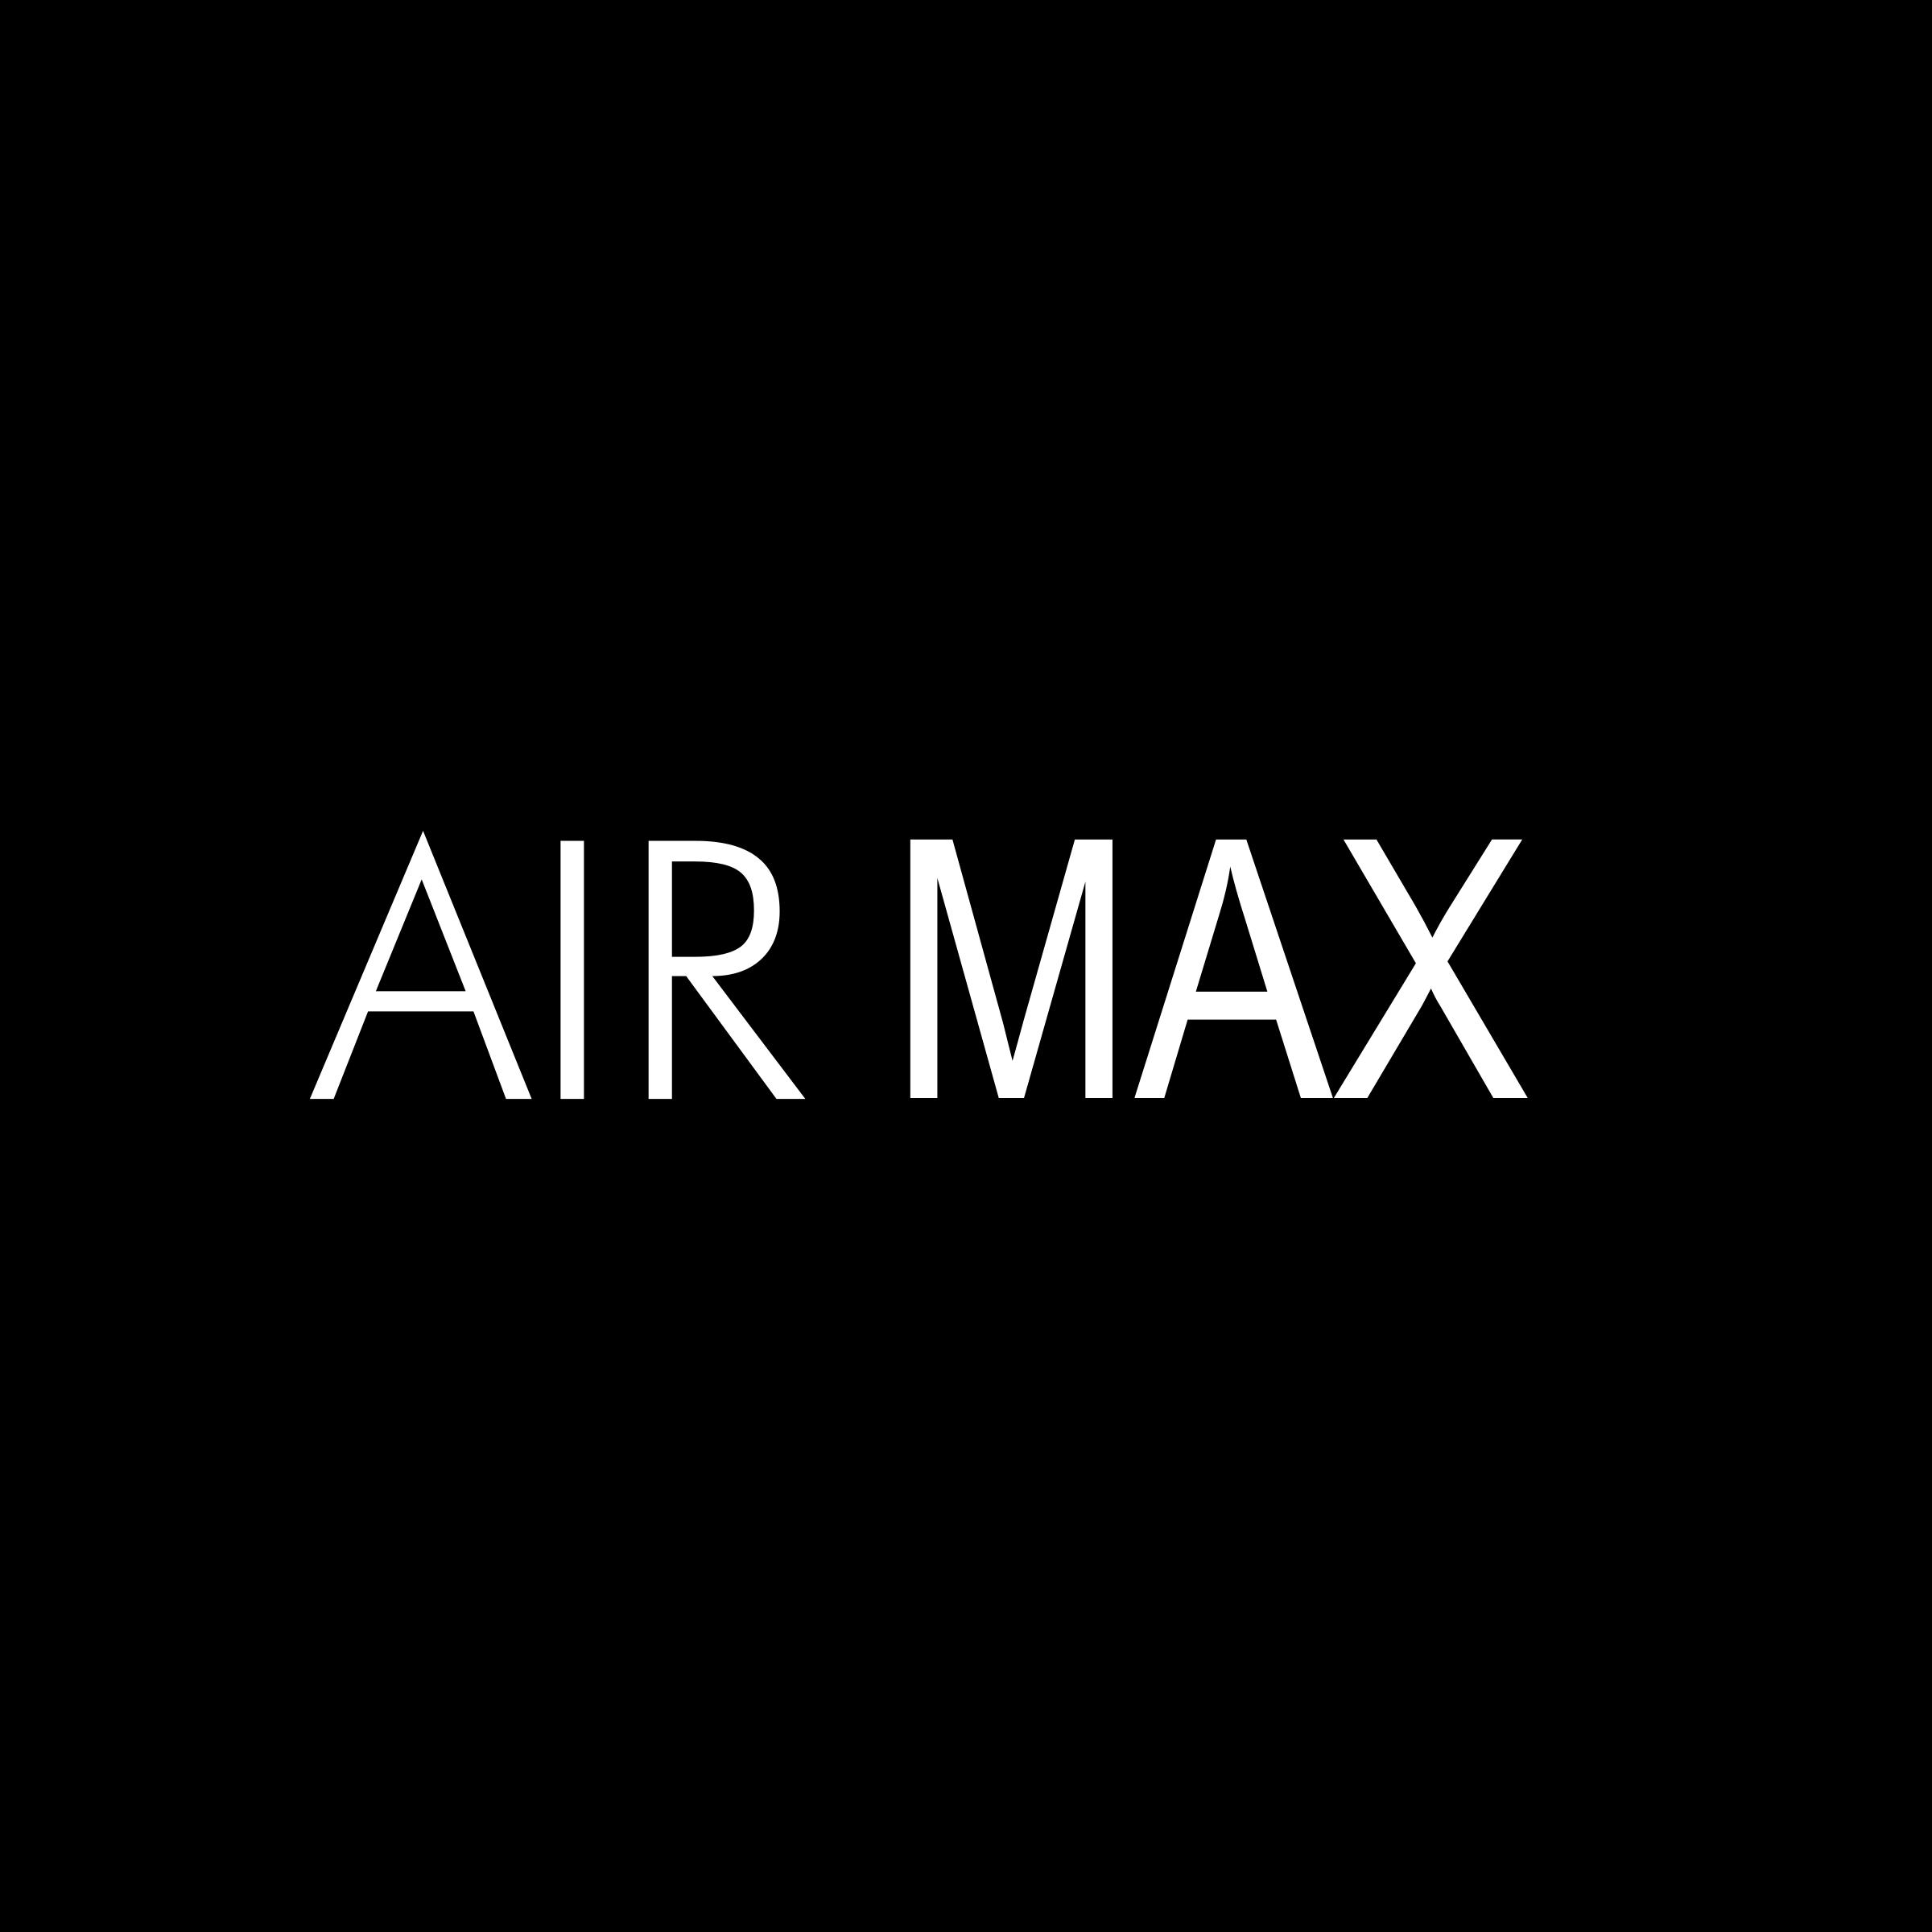 Airmax Logo Png Transparent Svg Vector Freebie Supply